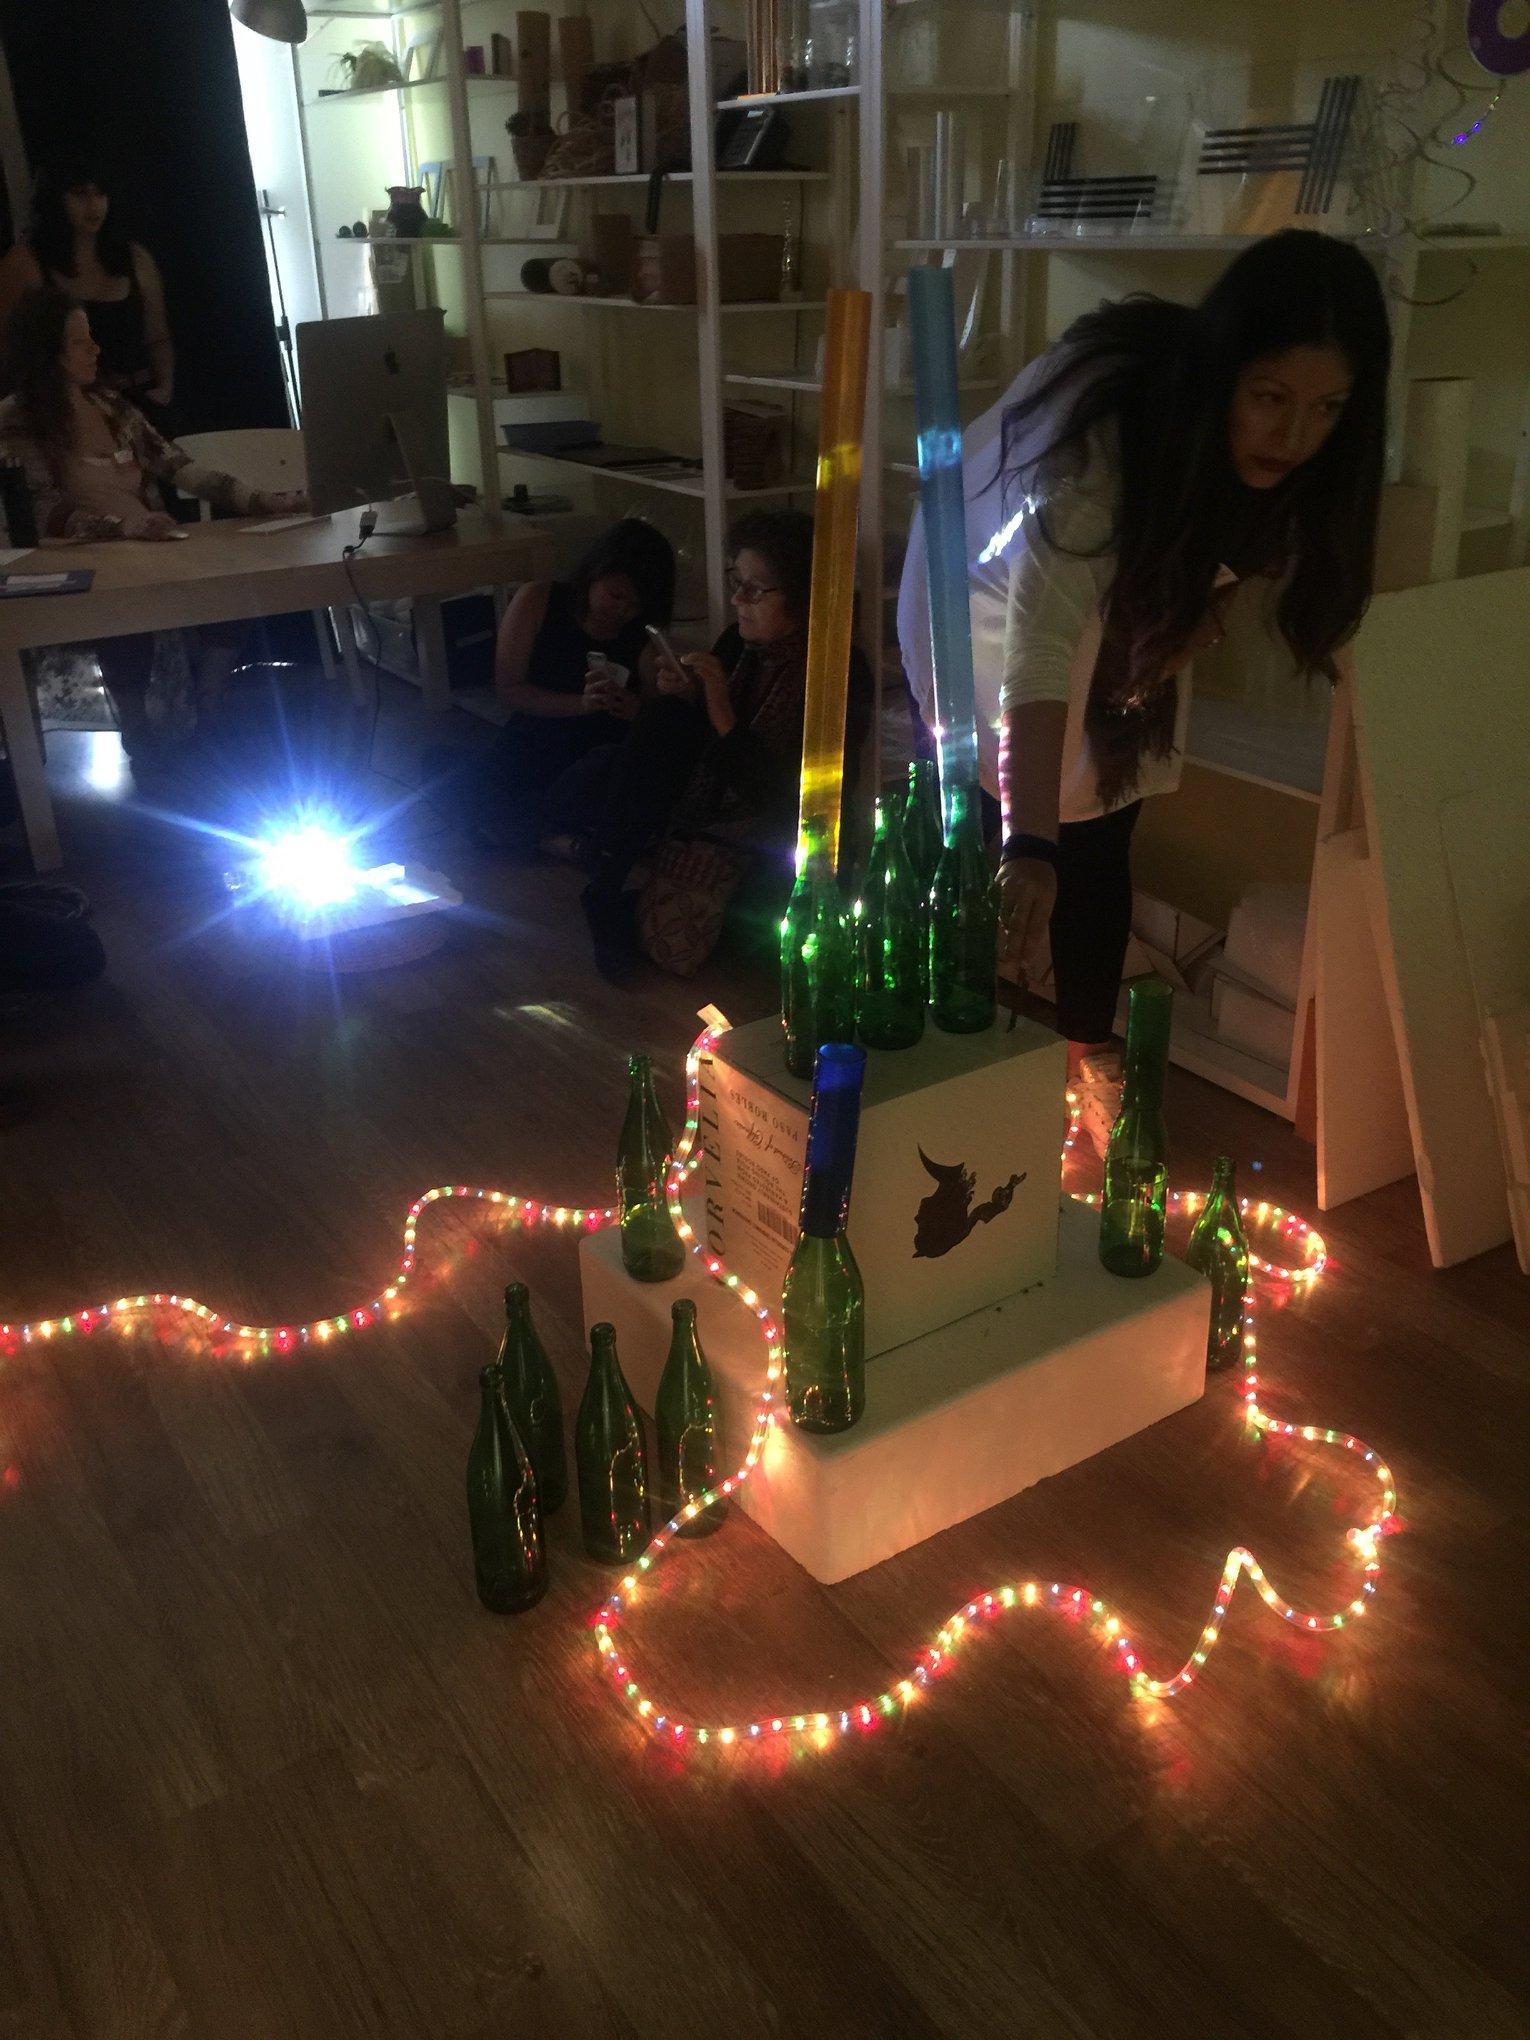 innovative-teacher-project-reggio-emilia-pilot